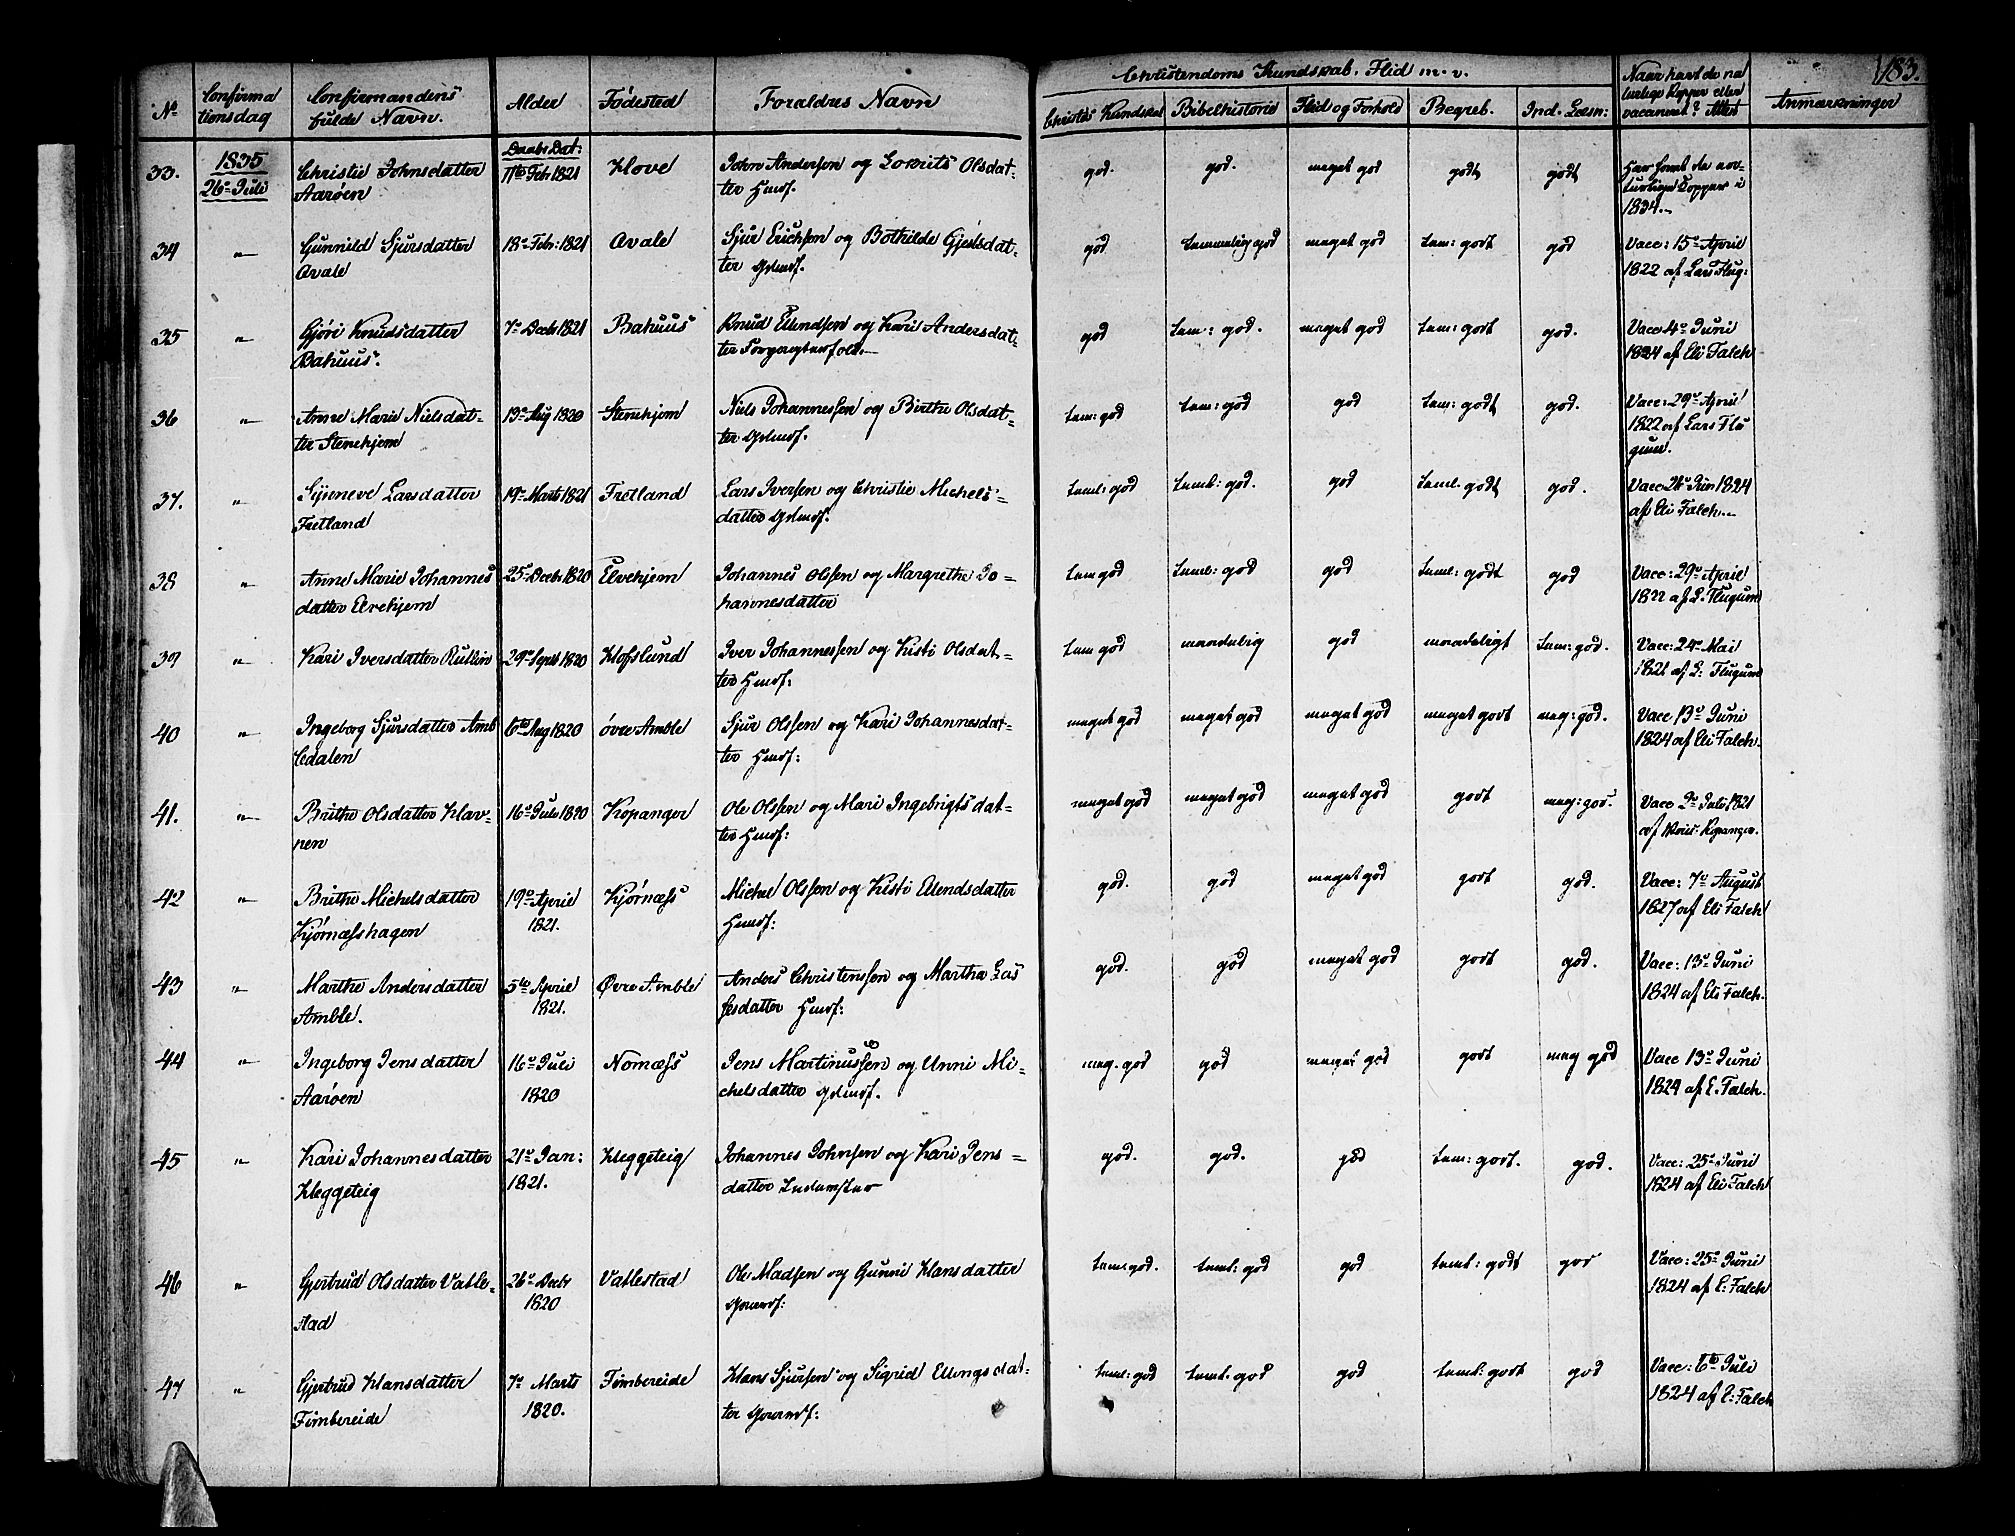 SAB, Sogndal sokneprestembete, H/Haa/Haaa/L0010: Ministerialbok nr. A 10, 1821-1838, s. 183